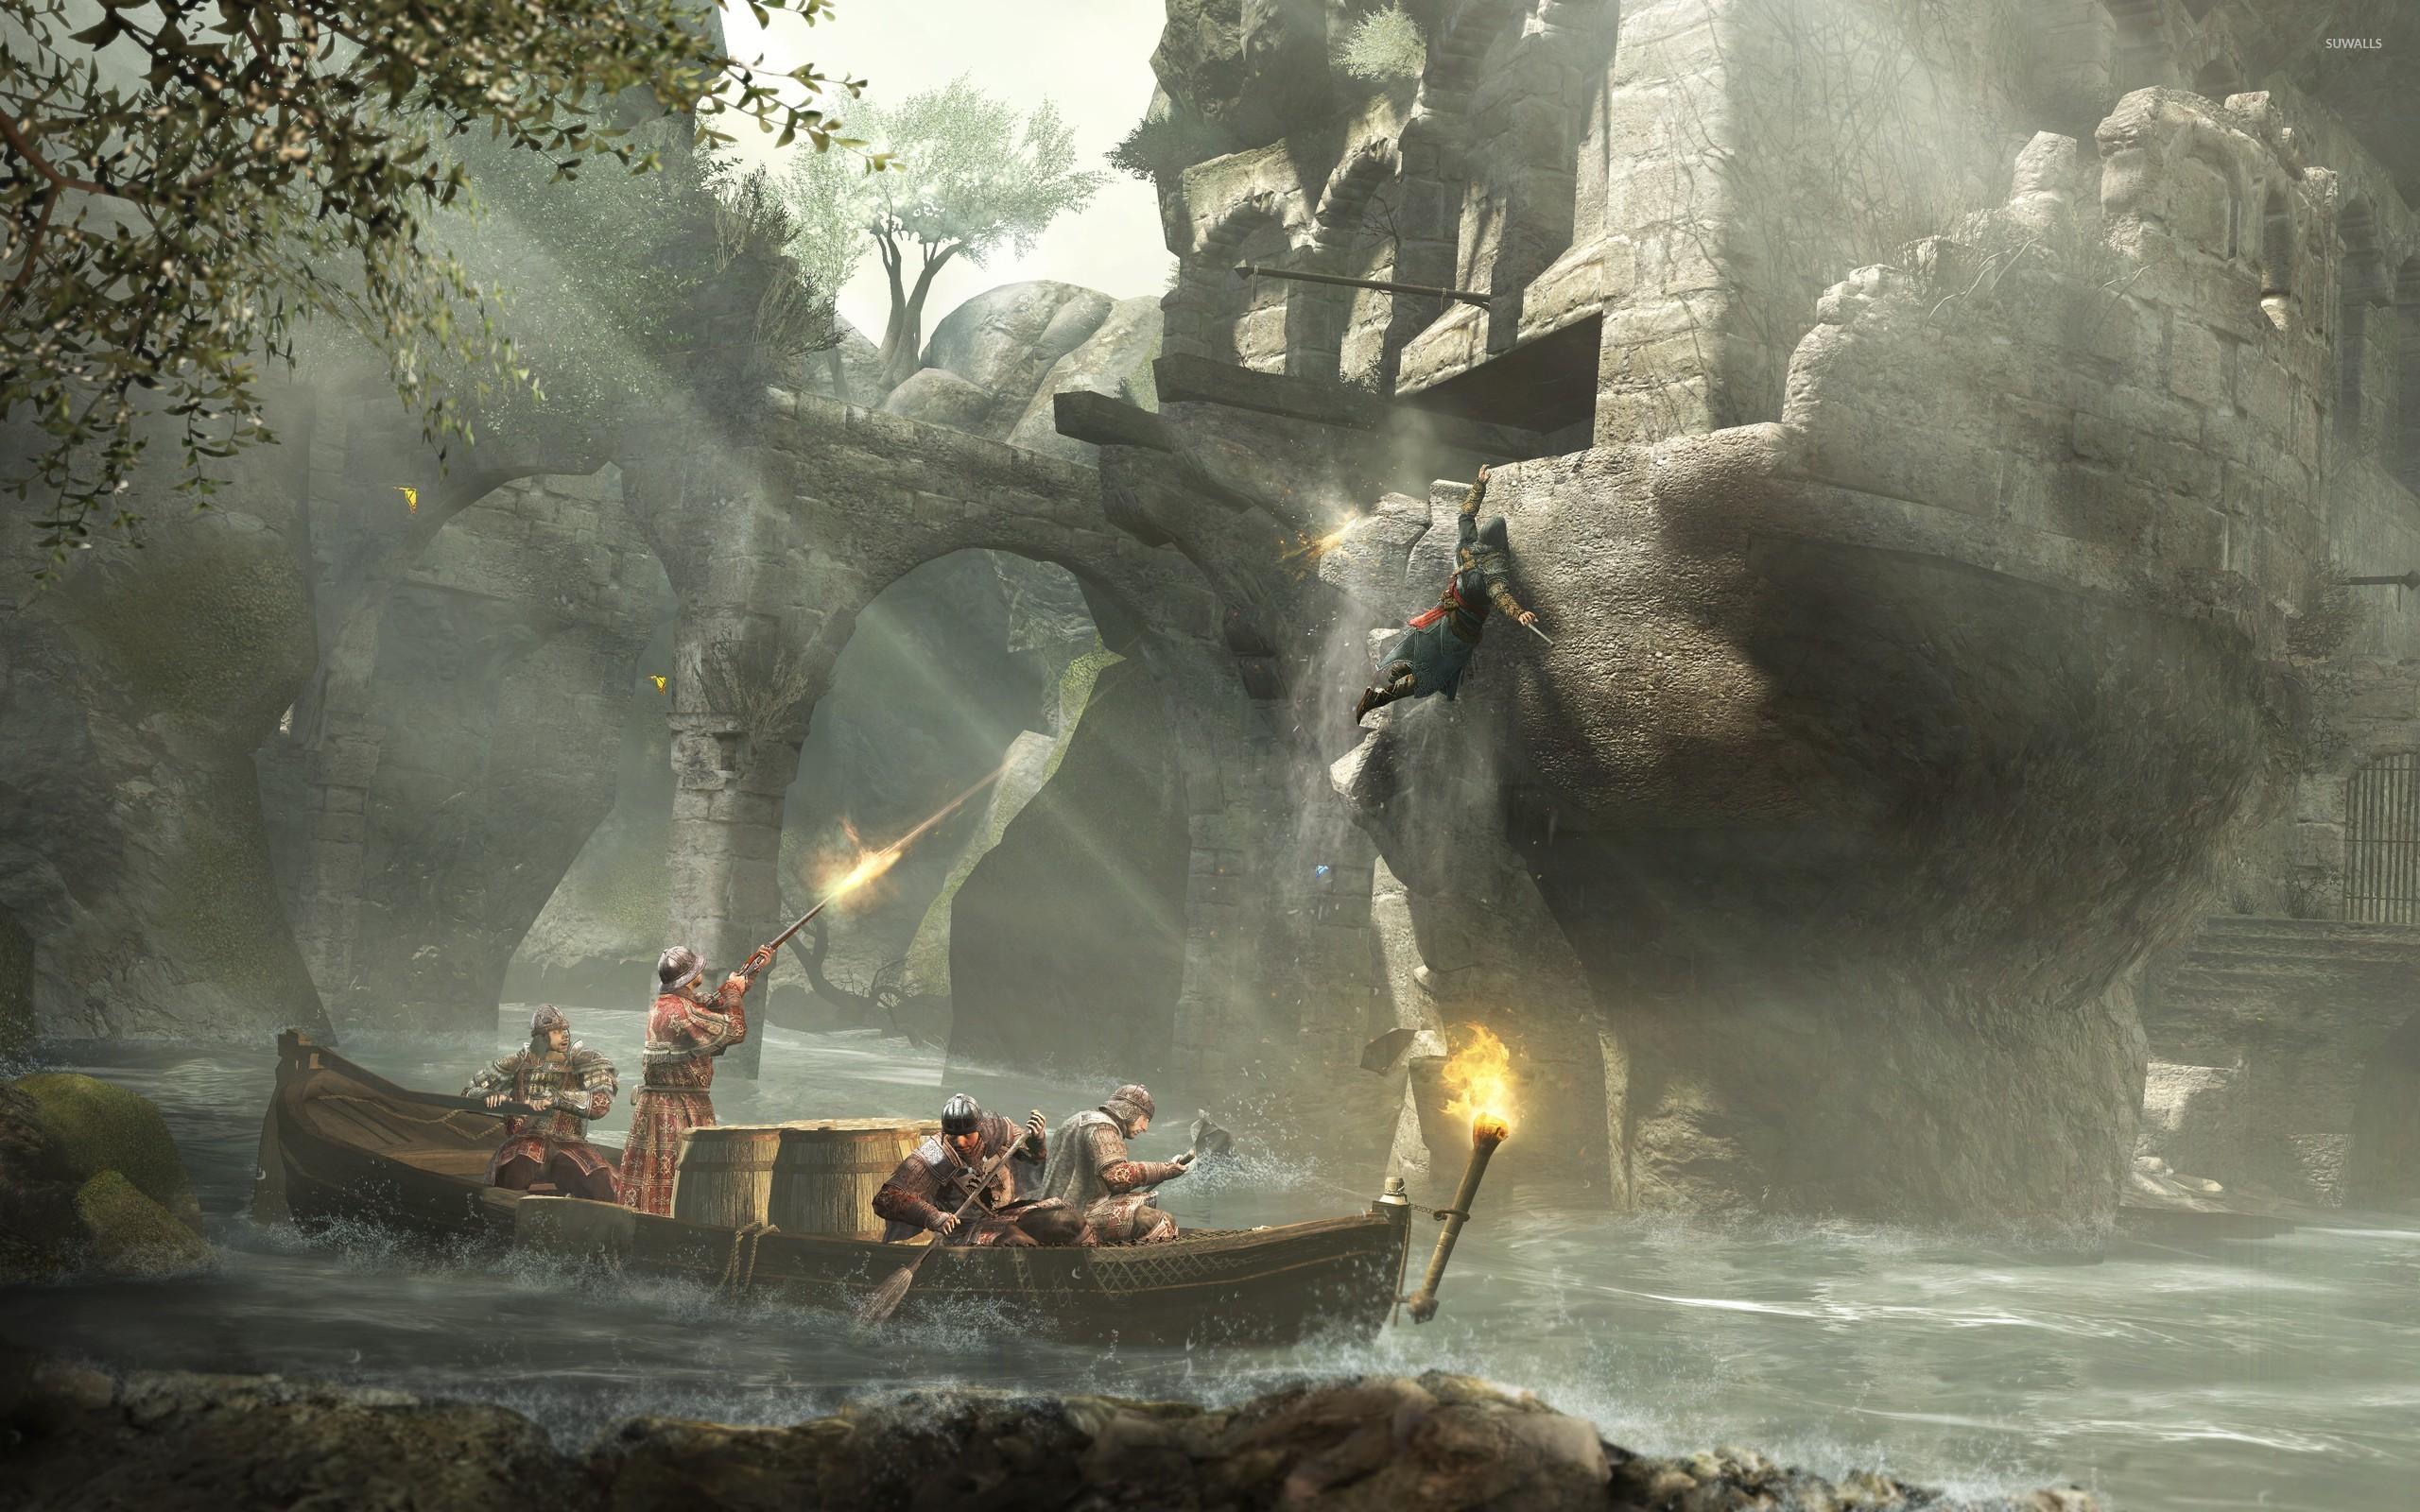 Assassin's Creed: Revelations [17] wallpaper